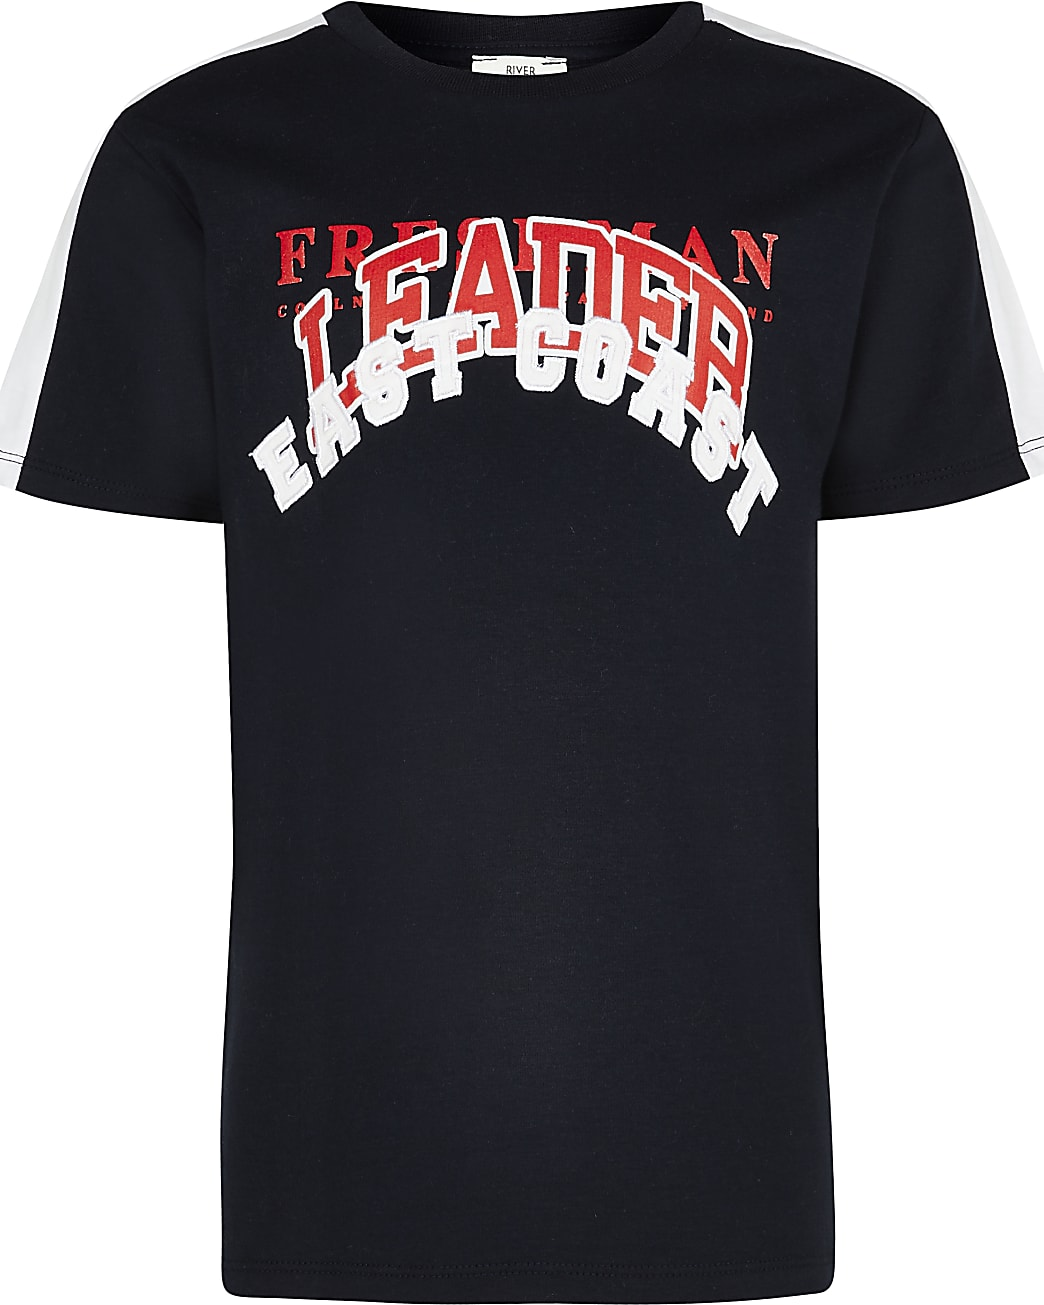 Age 13+ boys navy 'East coast' t-shirt